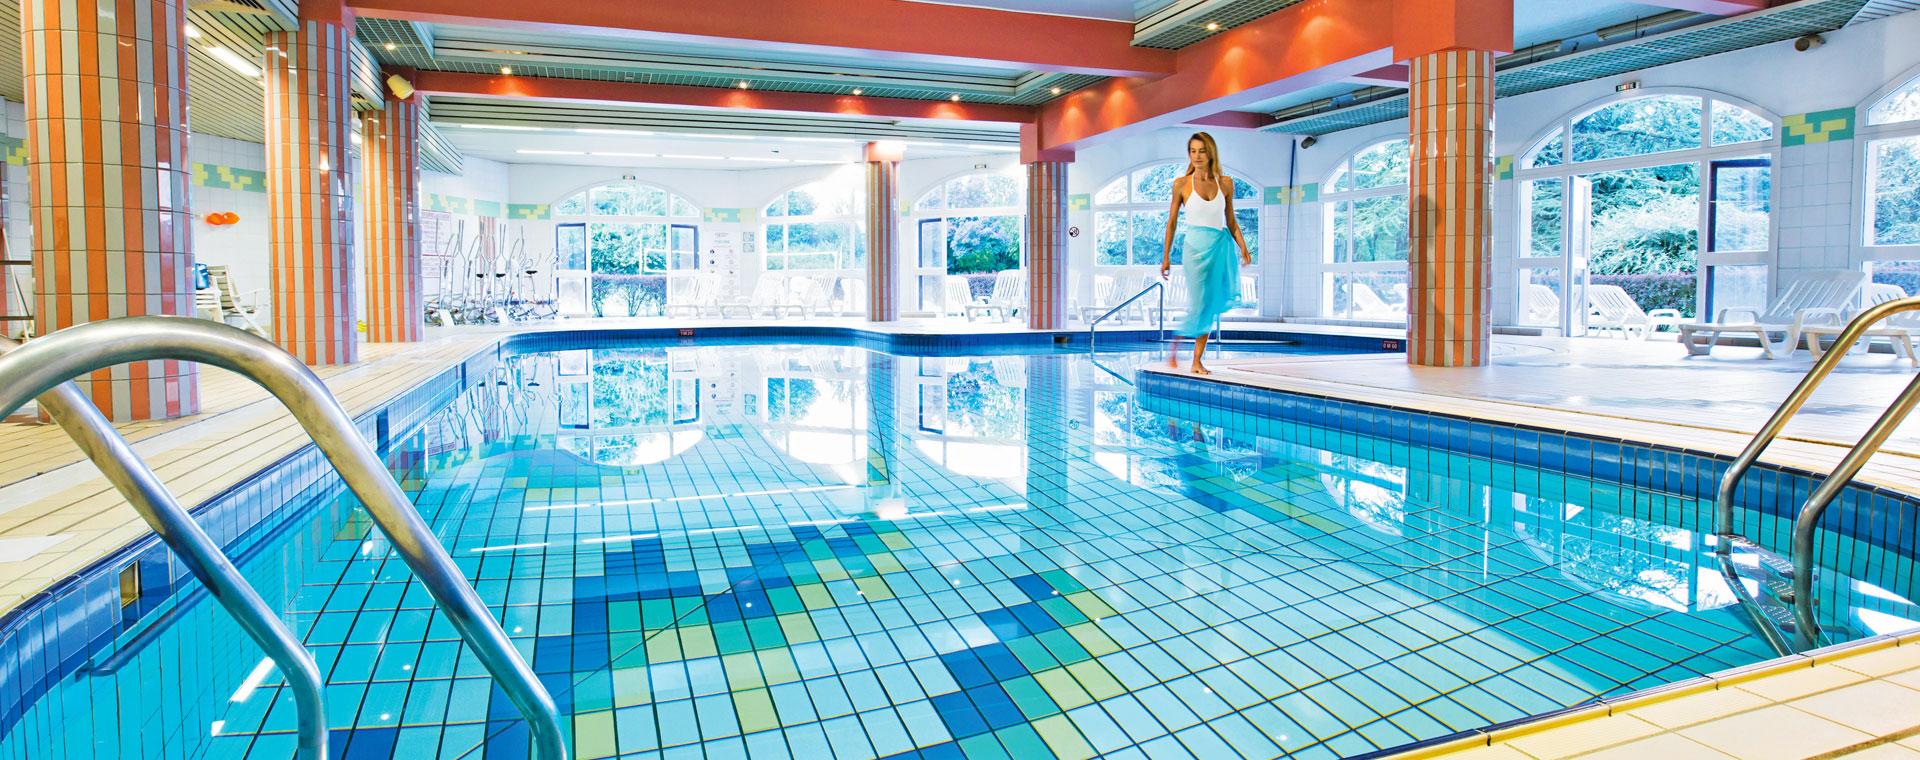 villa marlioz piscine